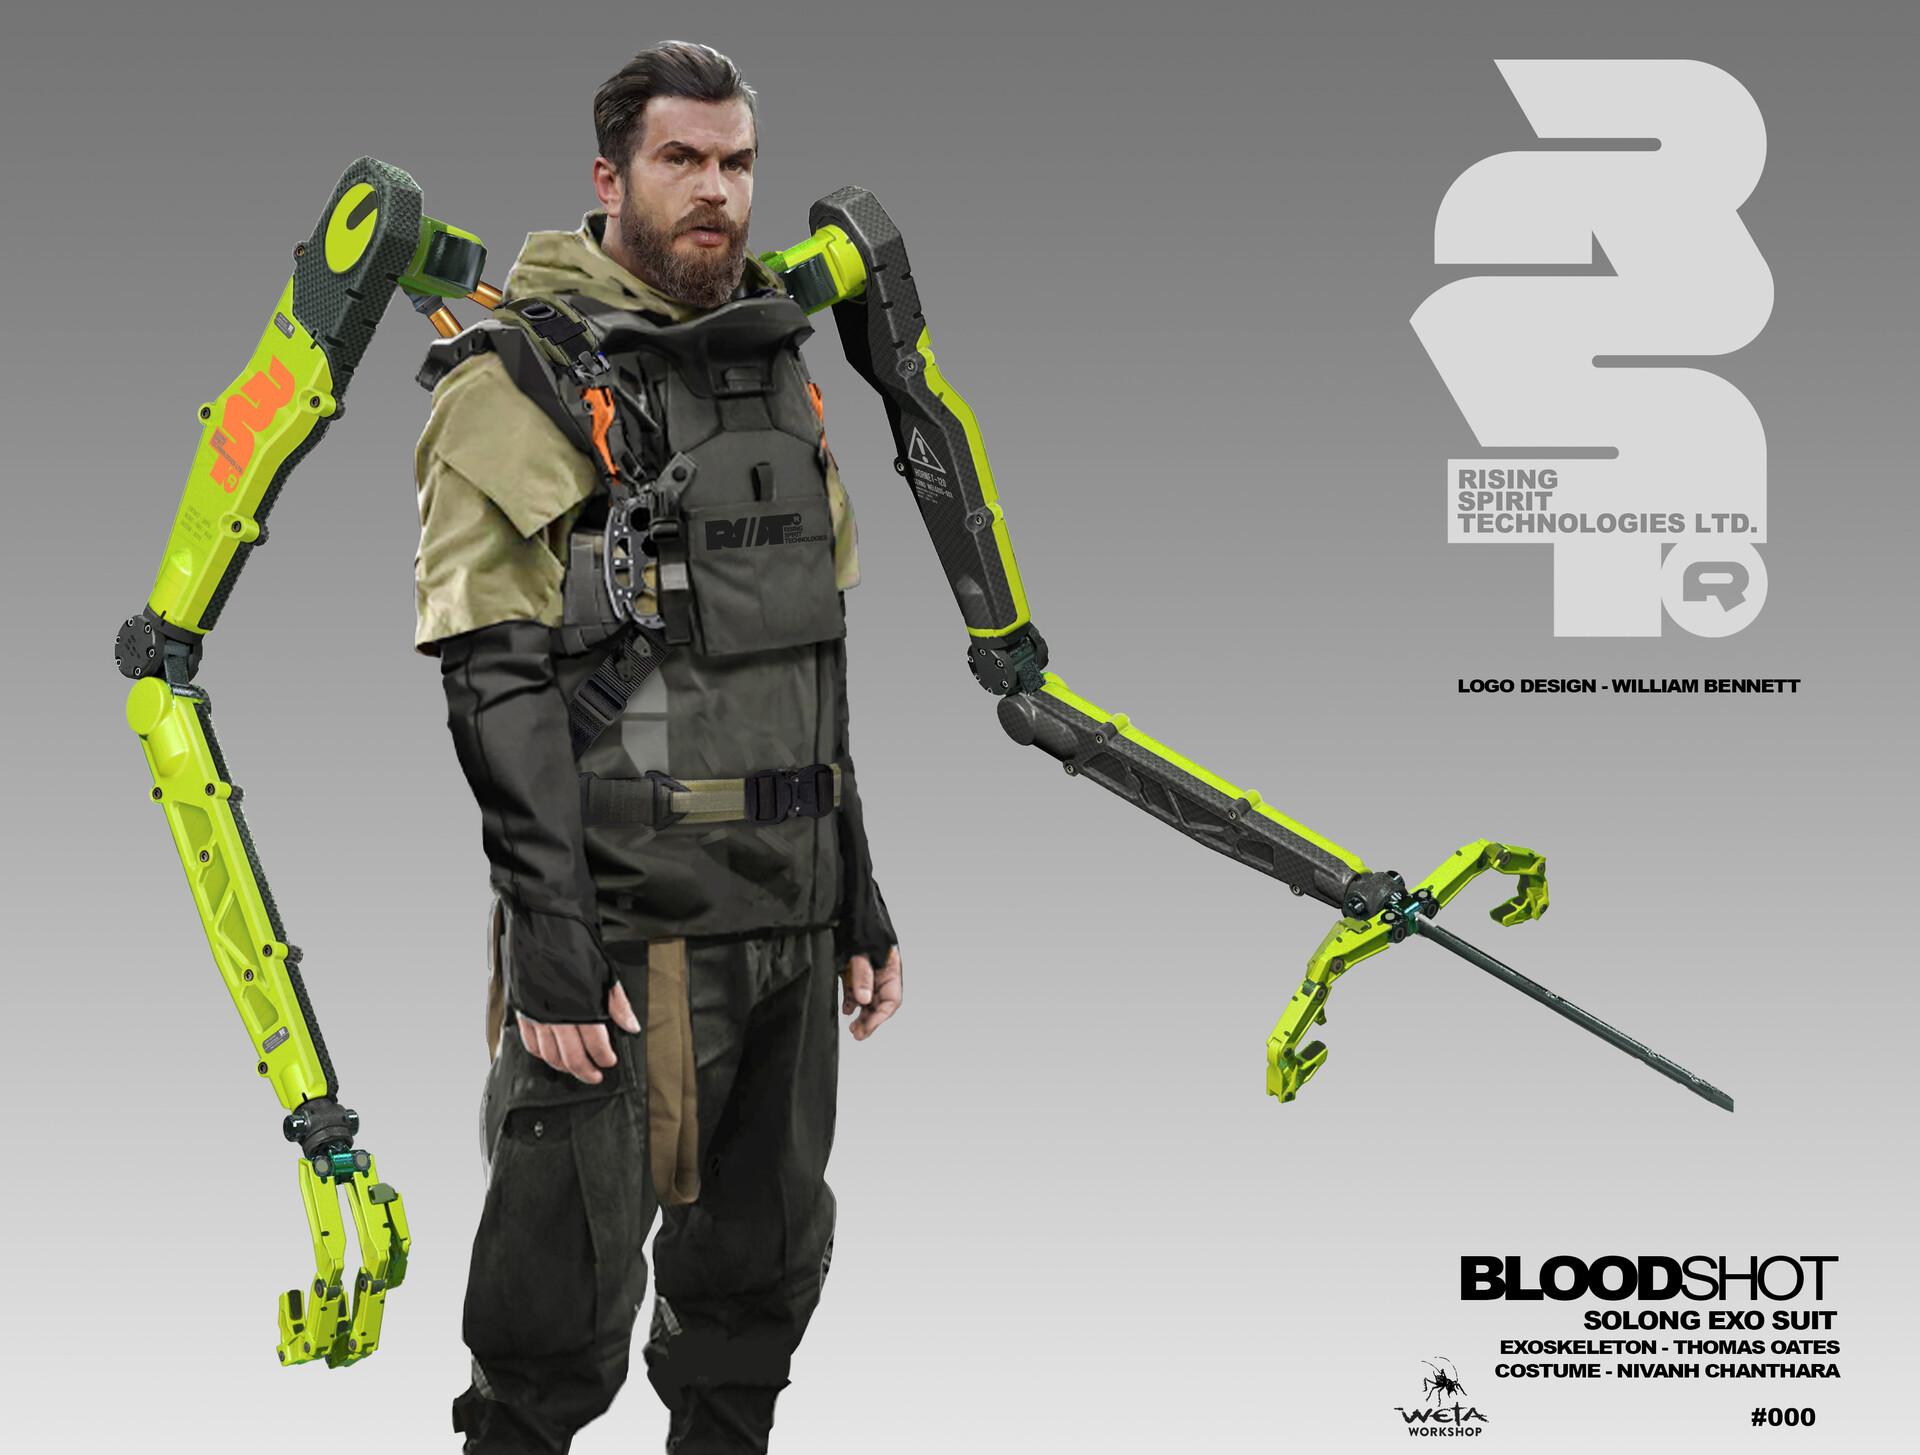 So Long Arm Concept - Artist: Thomas Oates (Costume: Nivanh Chanthara)